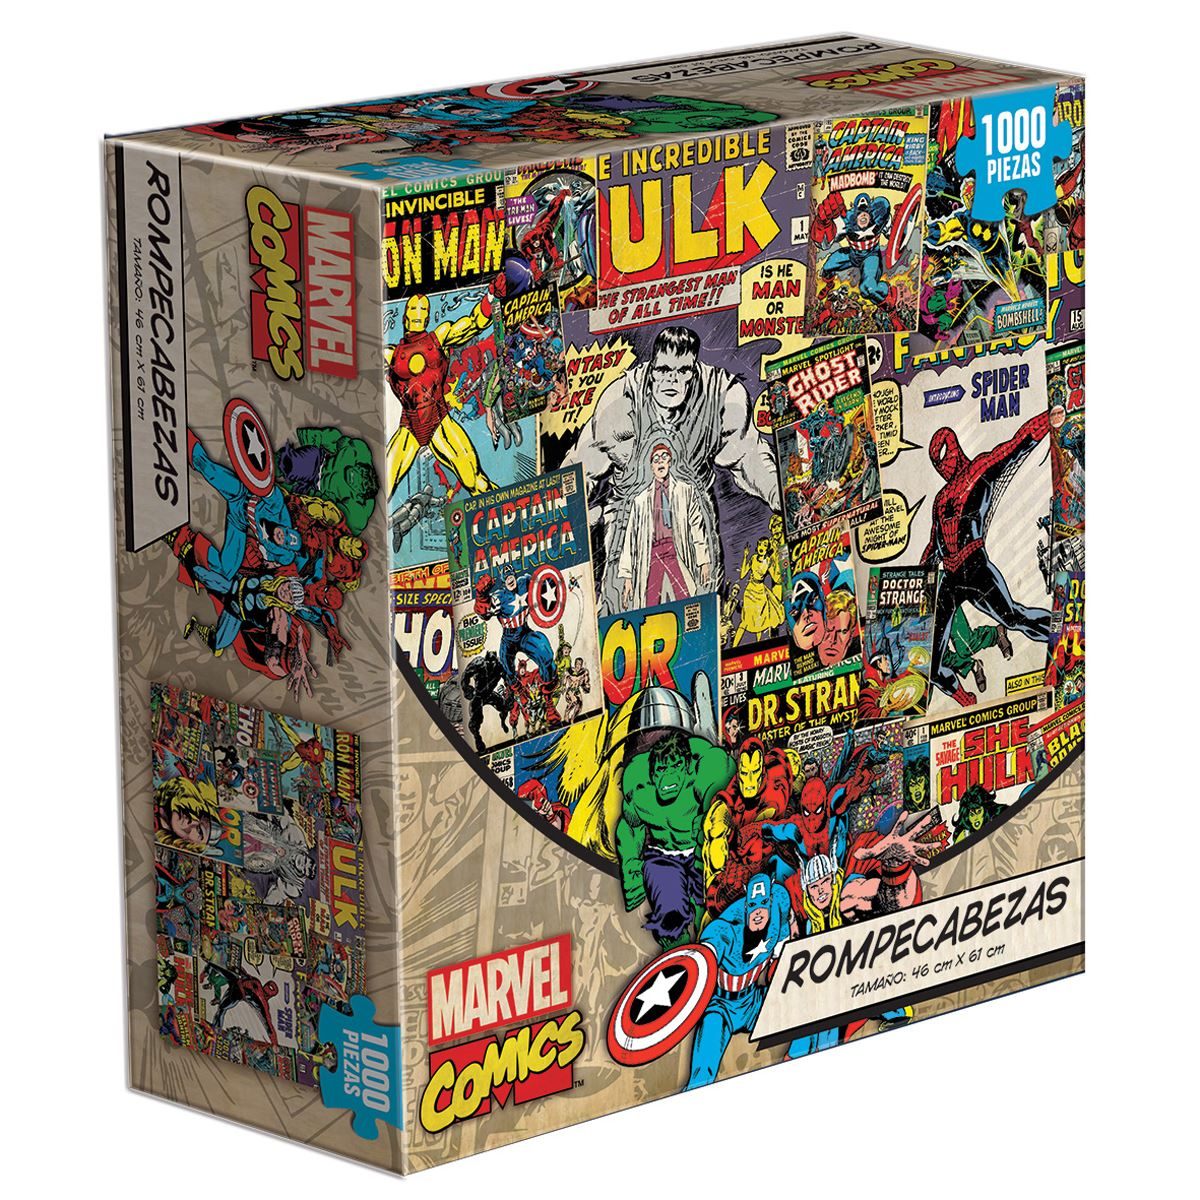 Rompecabezas adulto marvel comics 1000 piezas - Sanborns